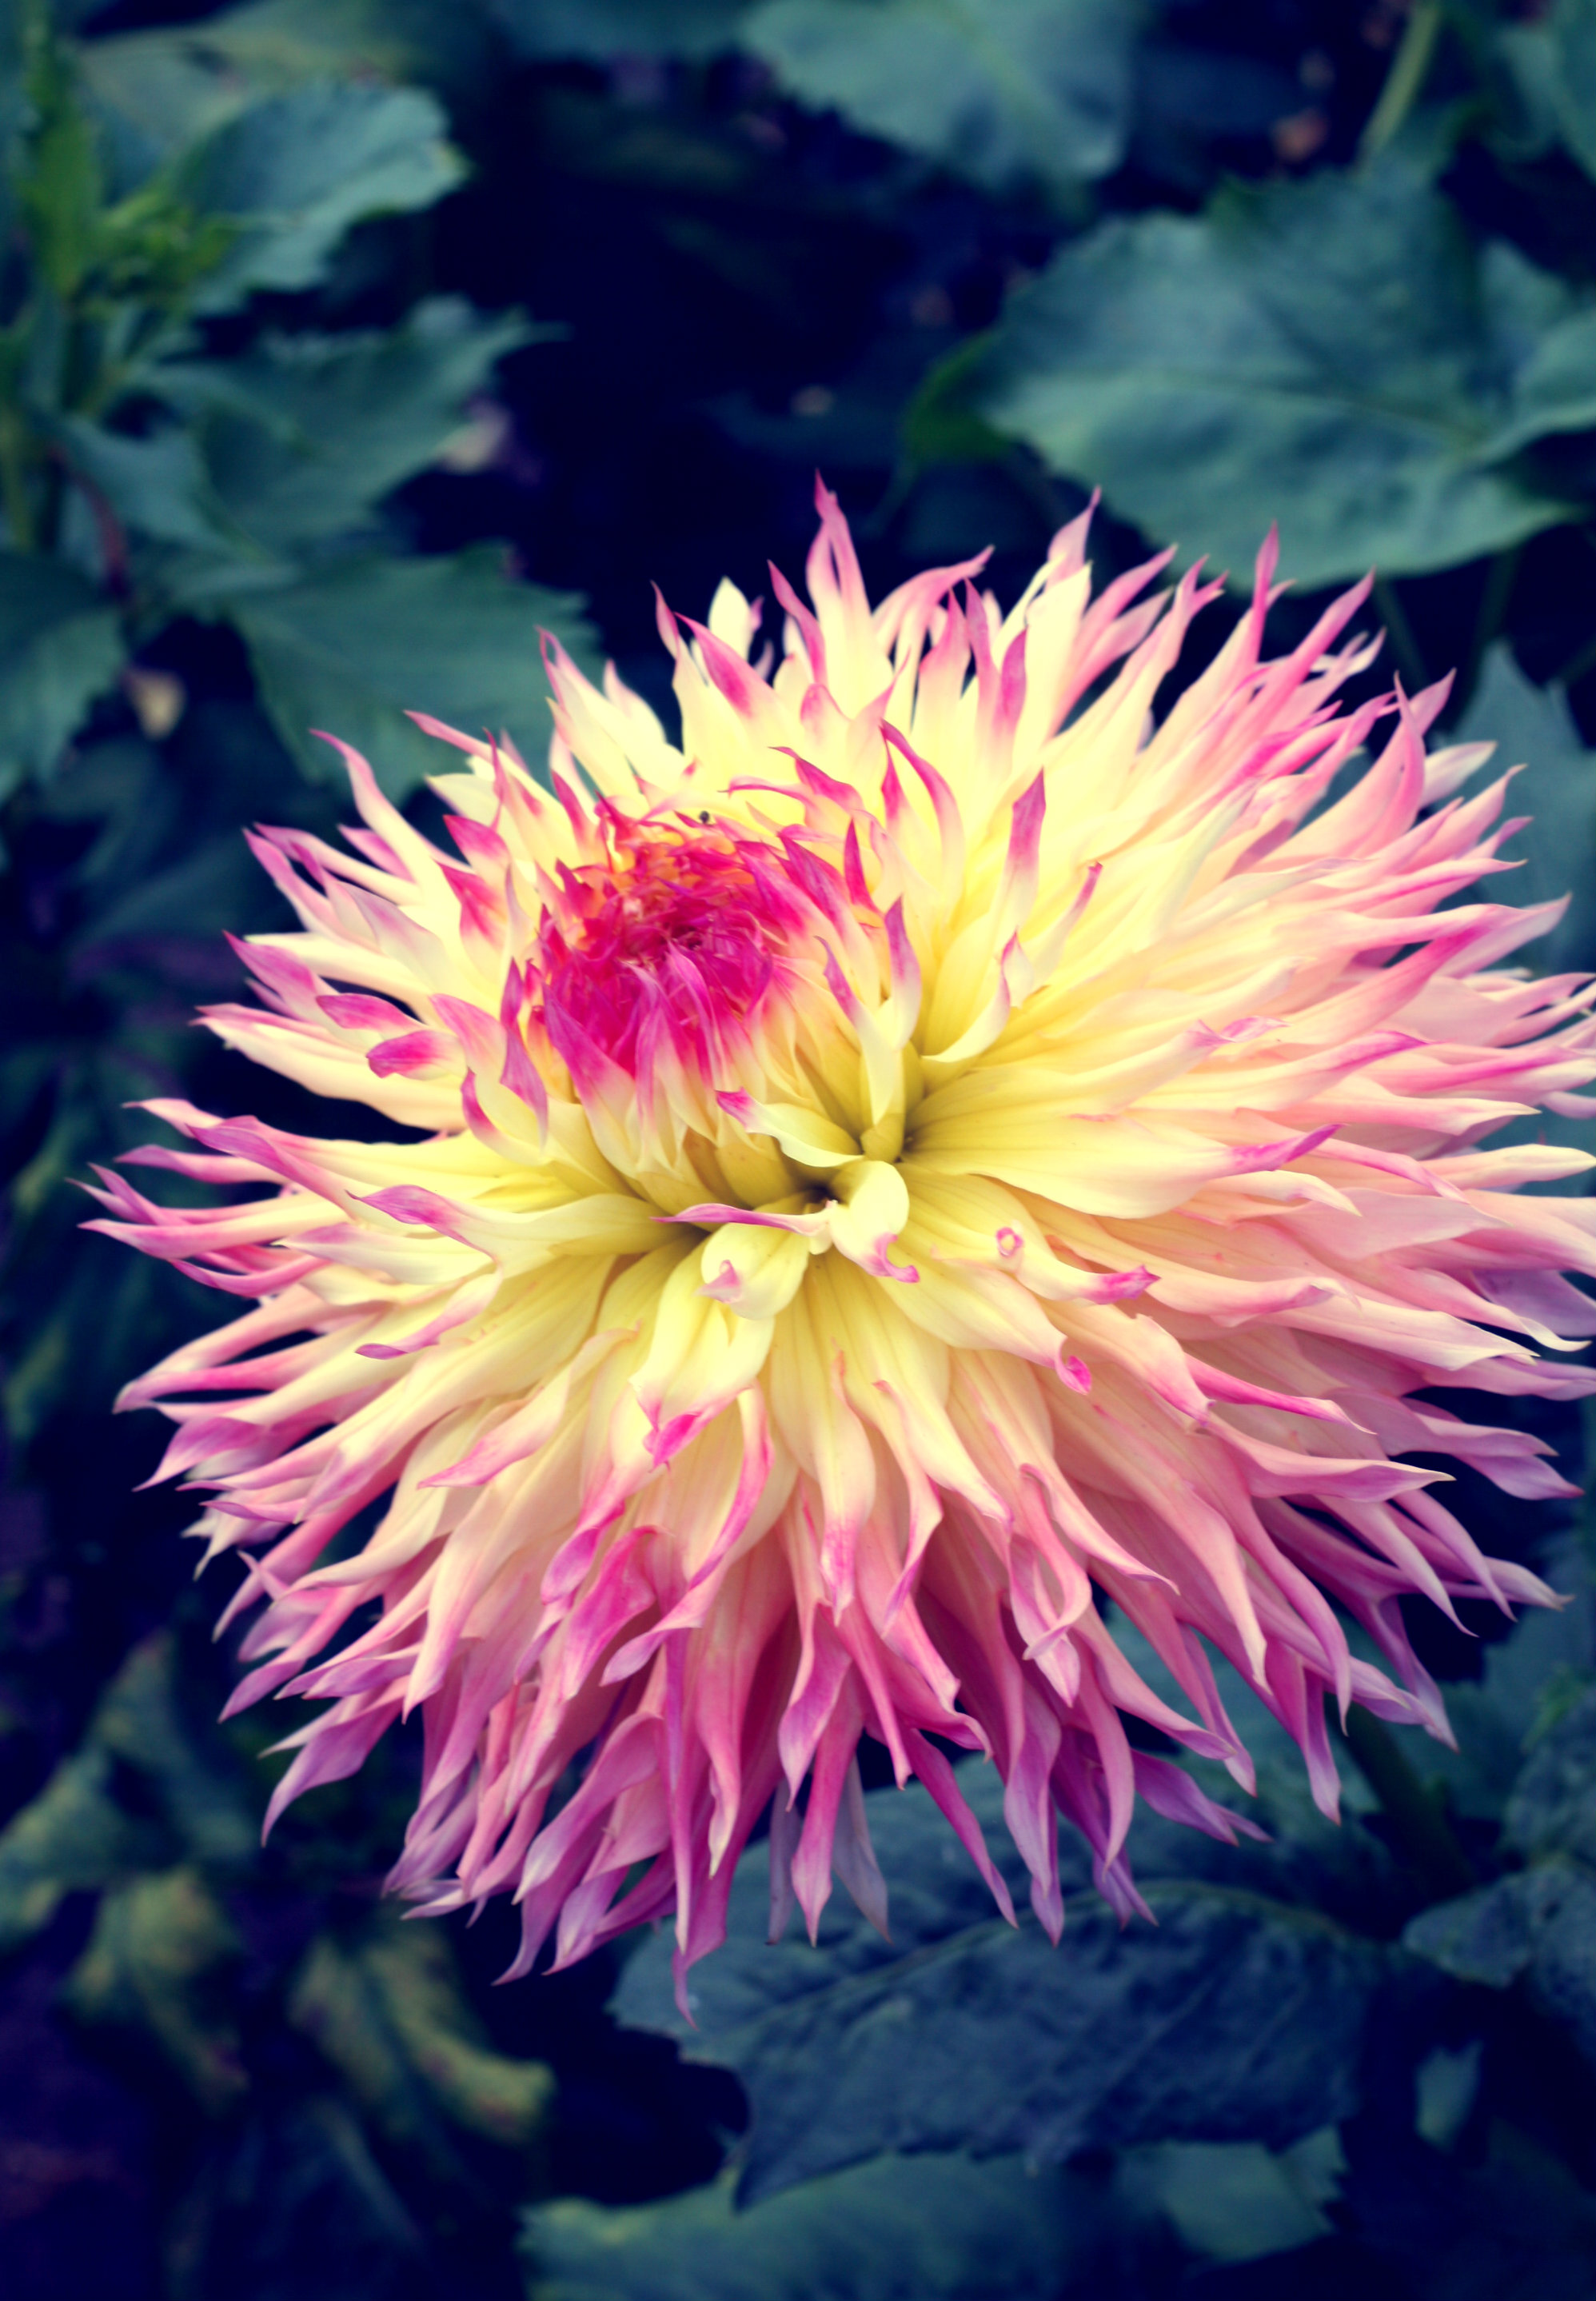 More To Love SF Golden Gate Park Dahlia Gardens Yellow And Pink Cactus  Dahlia